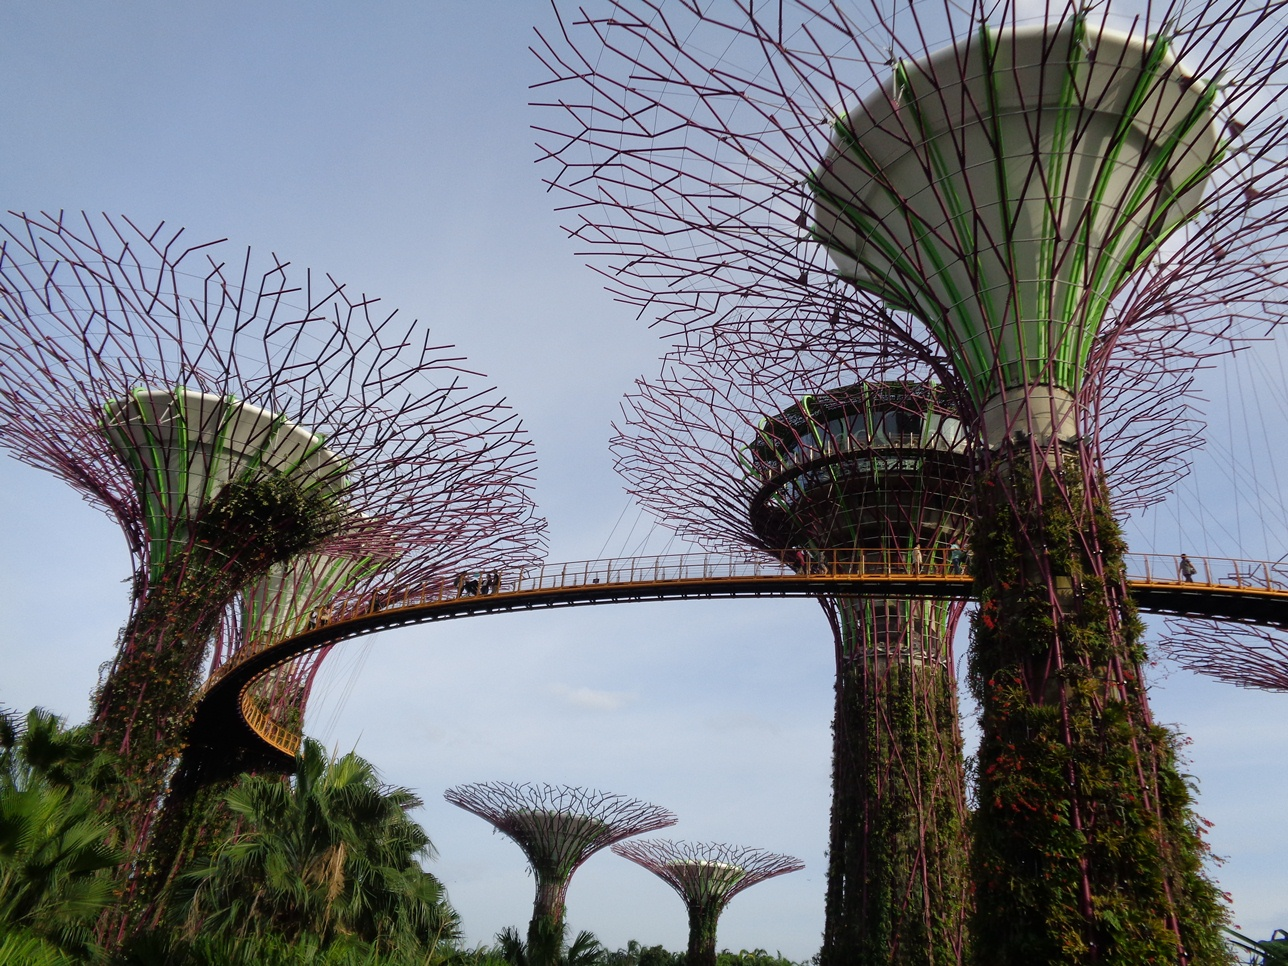 Traveling Johor Bahru Singapore On Weekend Tiket Masuk Garden By The Bay Anak Karna Merasa Kelaparan Akupun Ke Tempat Makan Memang Harga Makanan Disingapur Mahal Apalagi Ditempat Wisata Merogoh Kocek 9 Sgd Untuk Dapat 1 Porsi